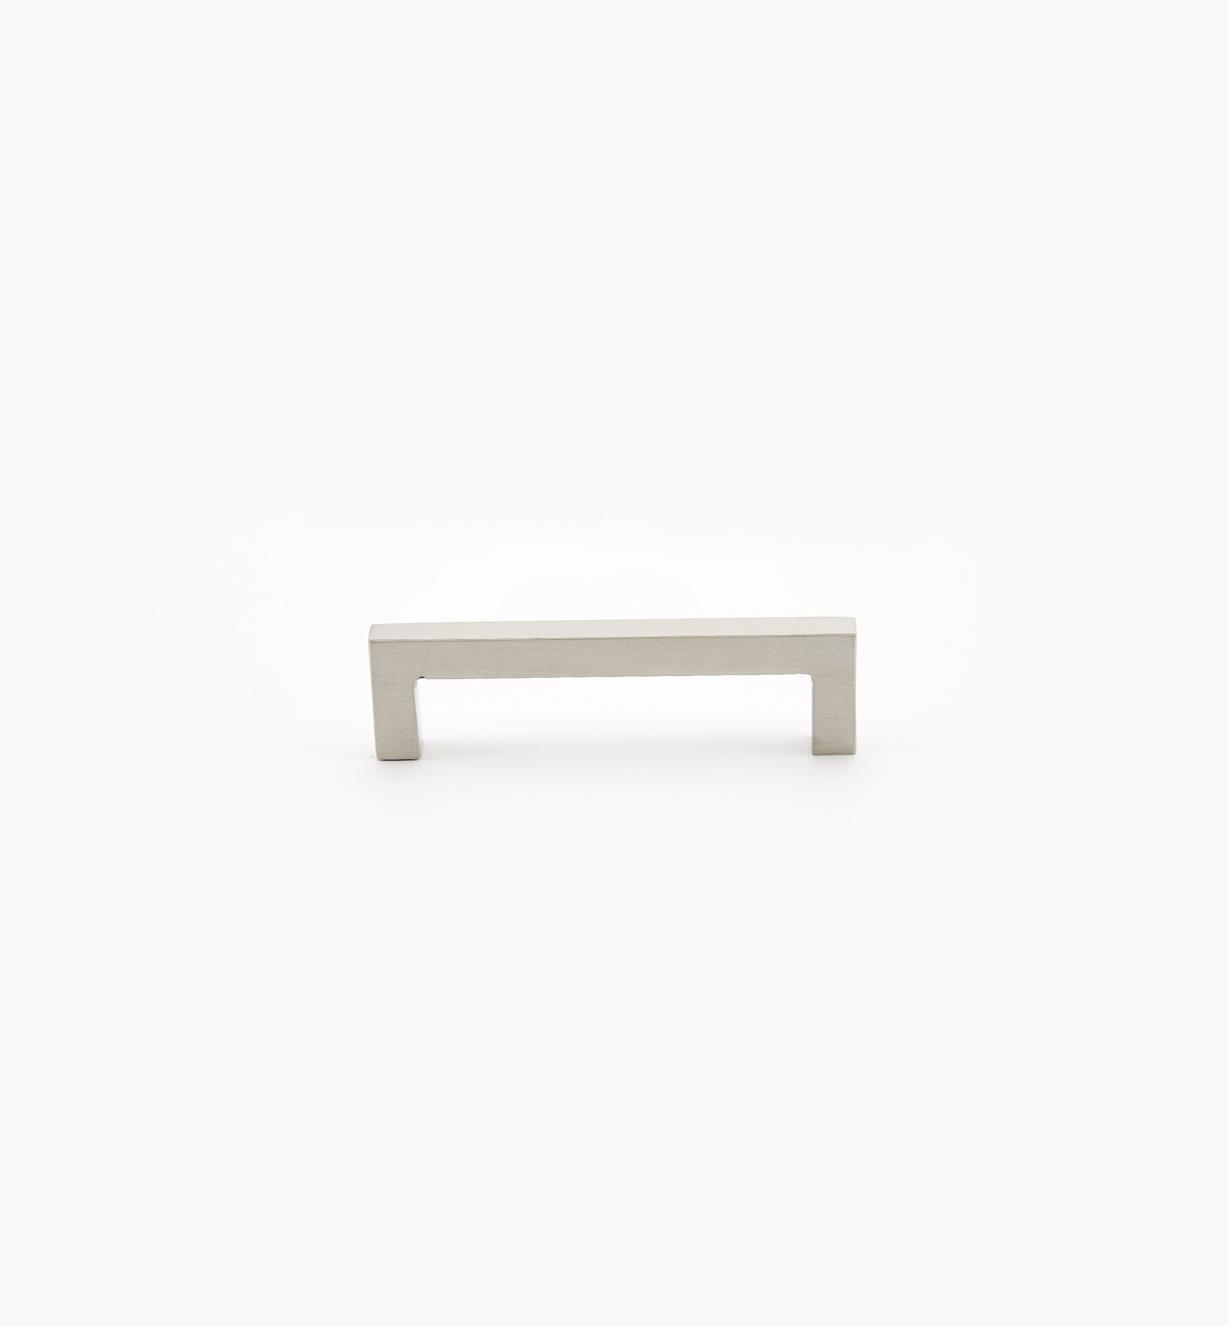 01W8411 - Poignée carrée en acier inoxydable, 96mm